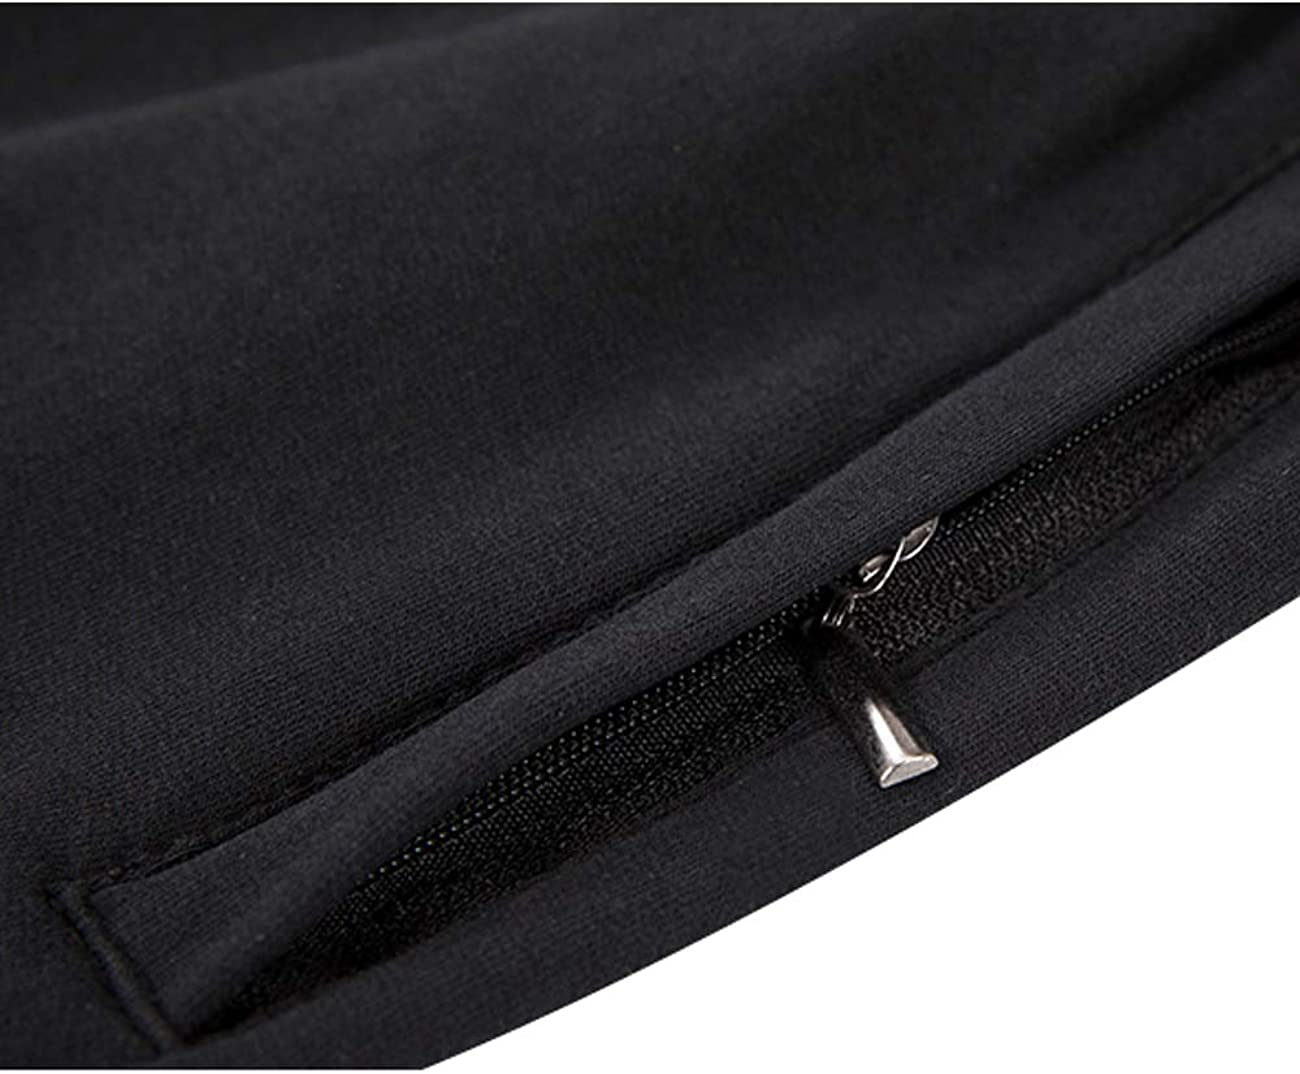 Zoulee Mens Casual Cotton Jogger Sweatpants Zipper Front Pants